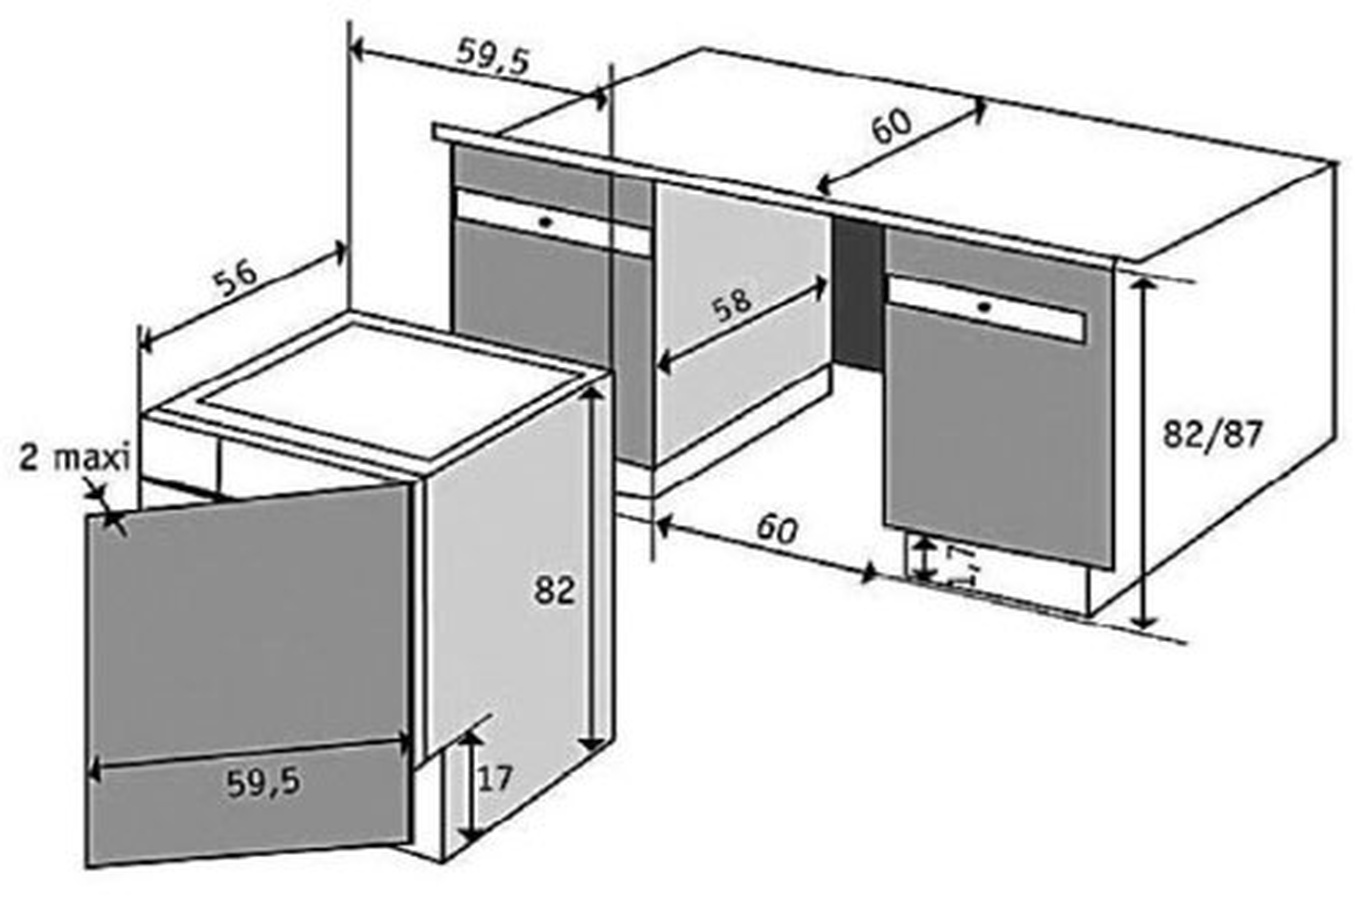 lave linge whirlpool awod060 pas cher. Black Bedroom Furniture Sets. Home Design Ideas